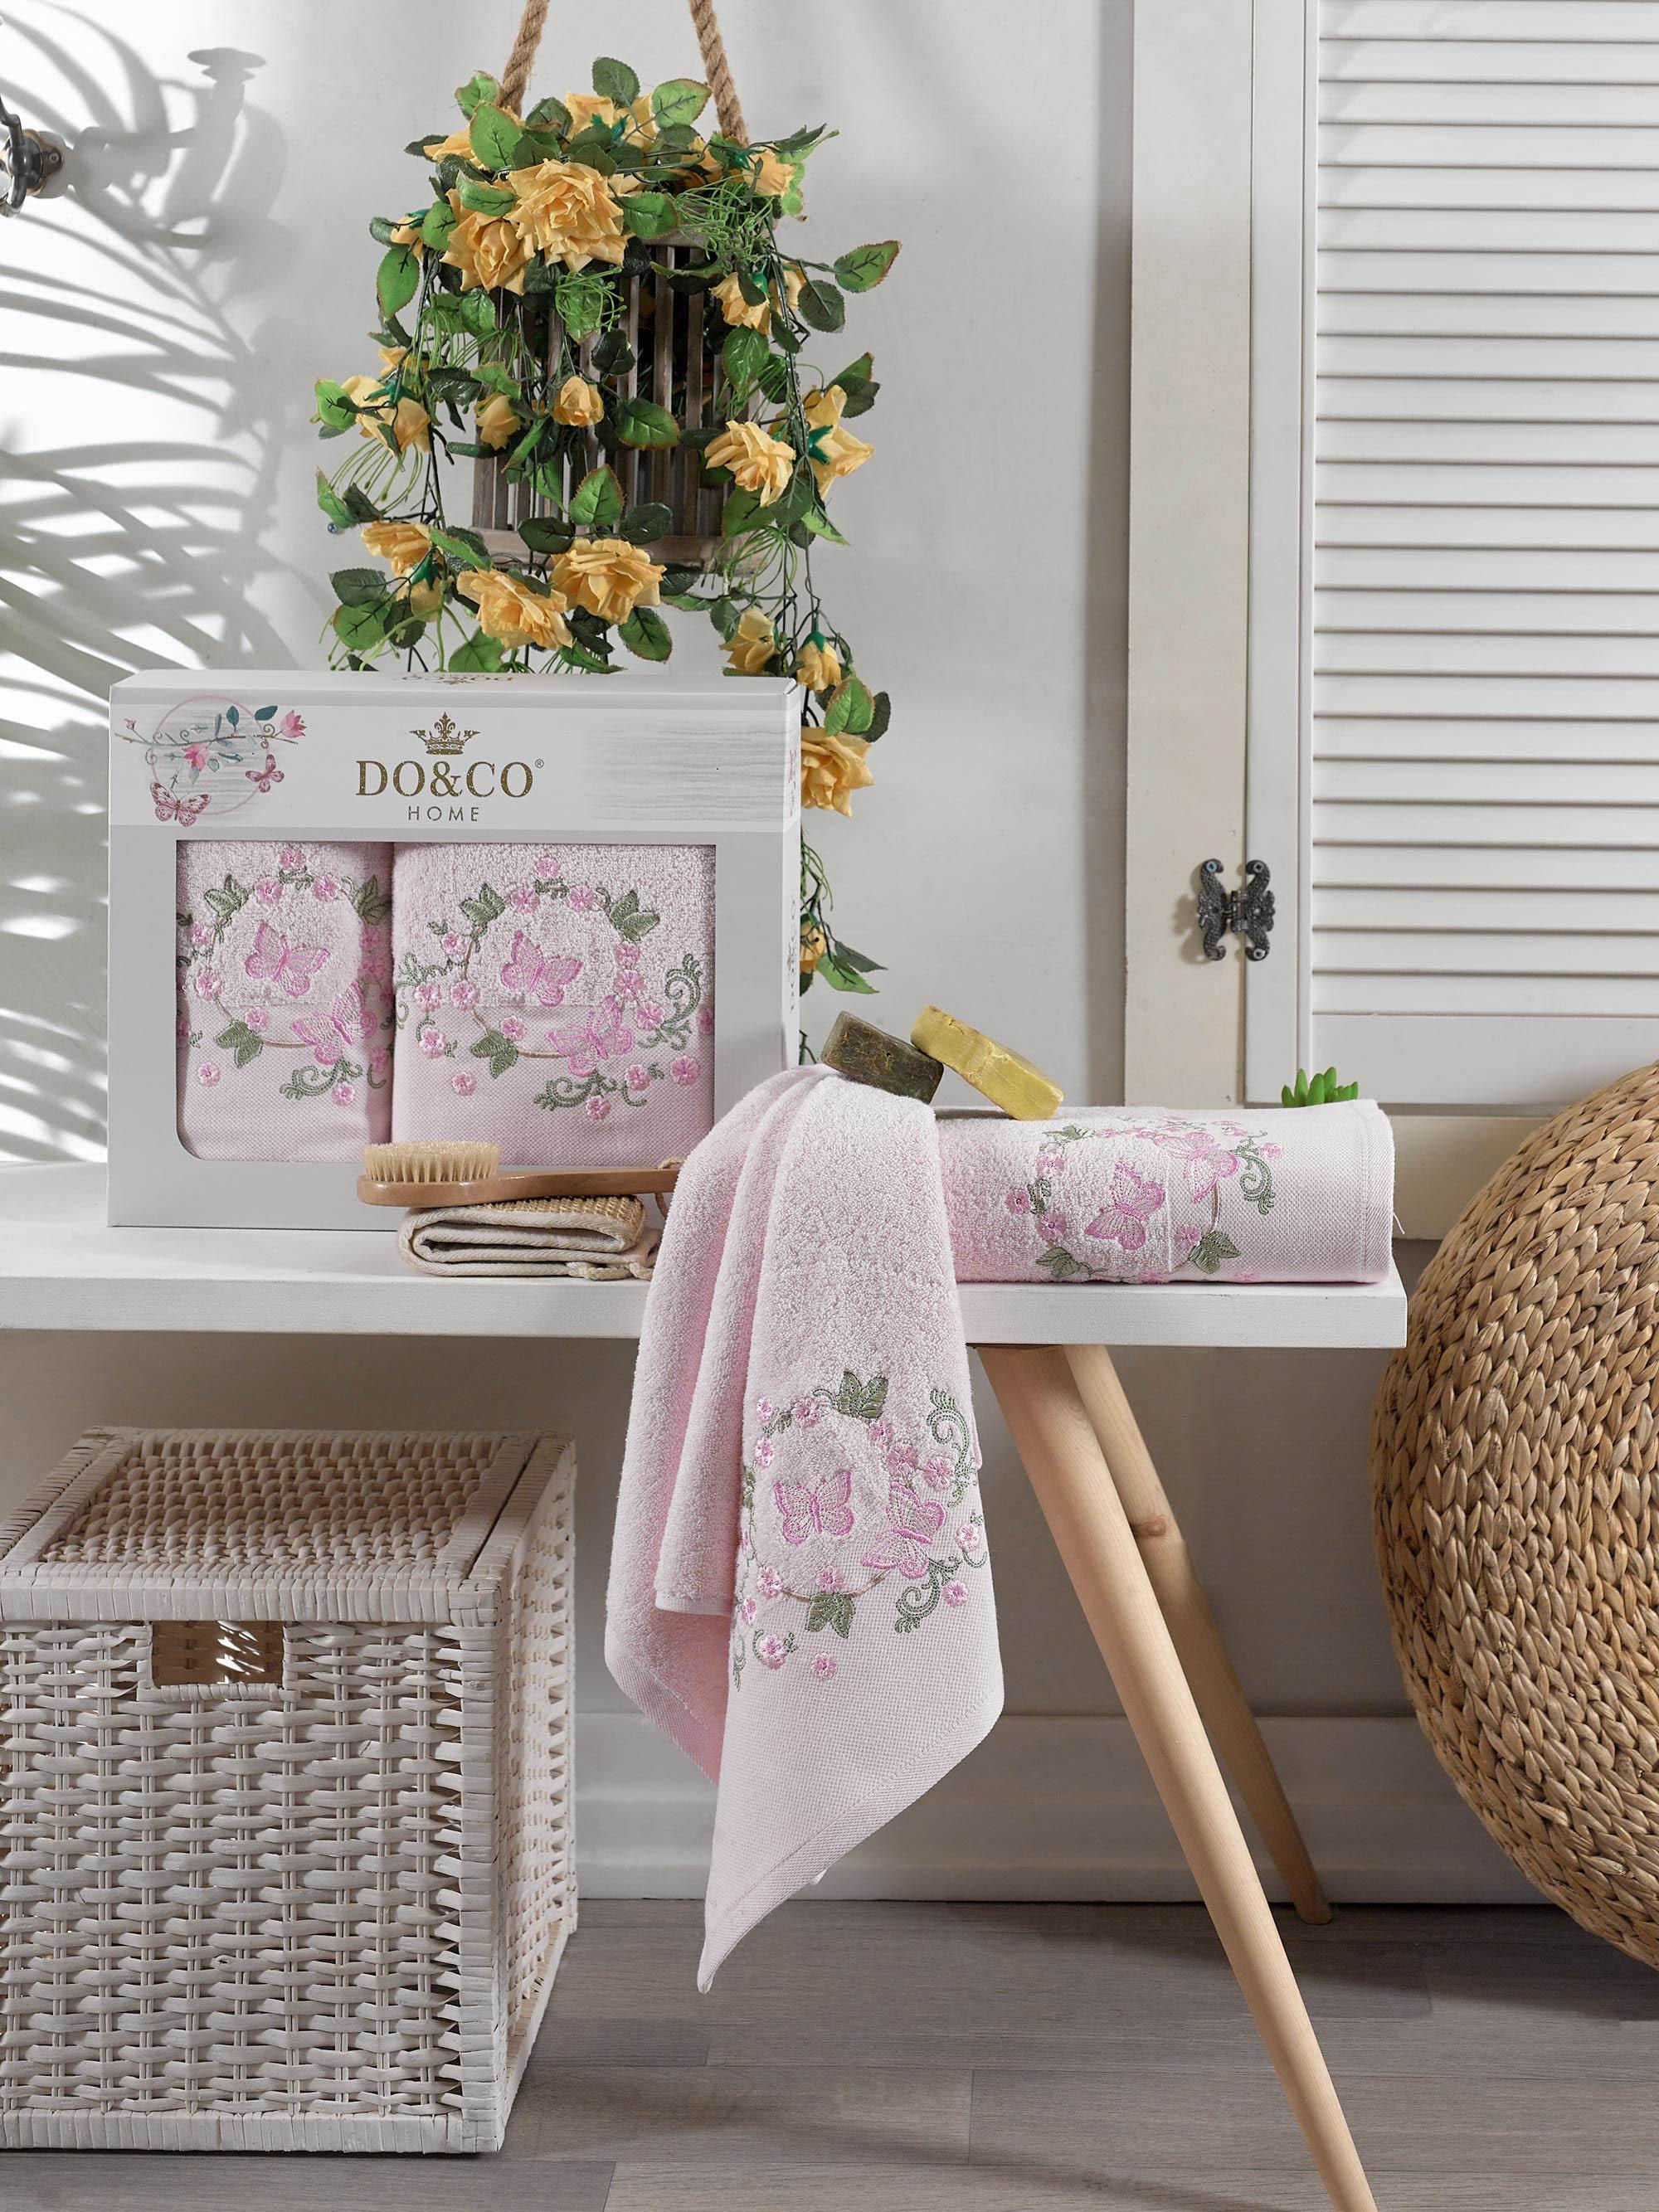 Полотенца DO'n'CO Полотенце Farfalla Цвет: Розовый (50х90 см, 70х140 см) набор из 3 полотенец merzuka sakura 50х90 2 70х140 8432 оранжевый